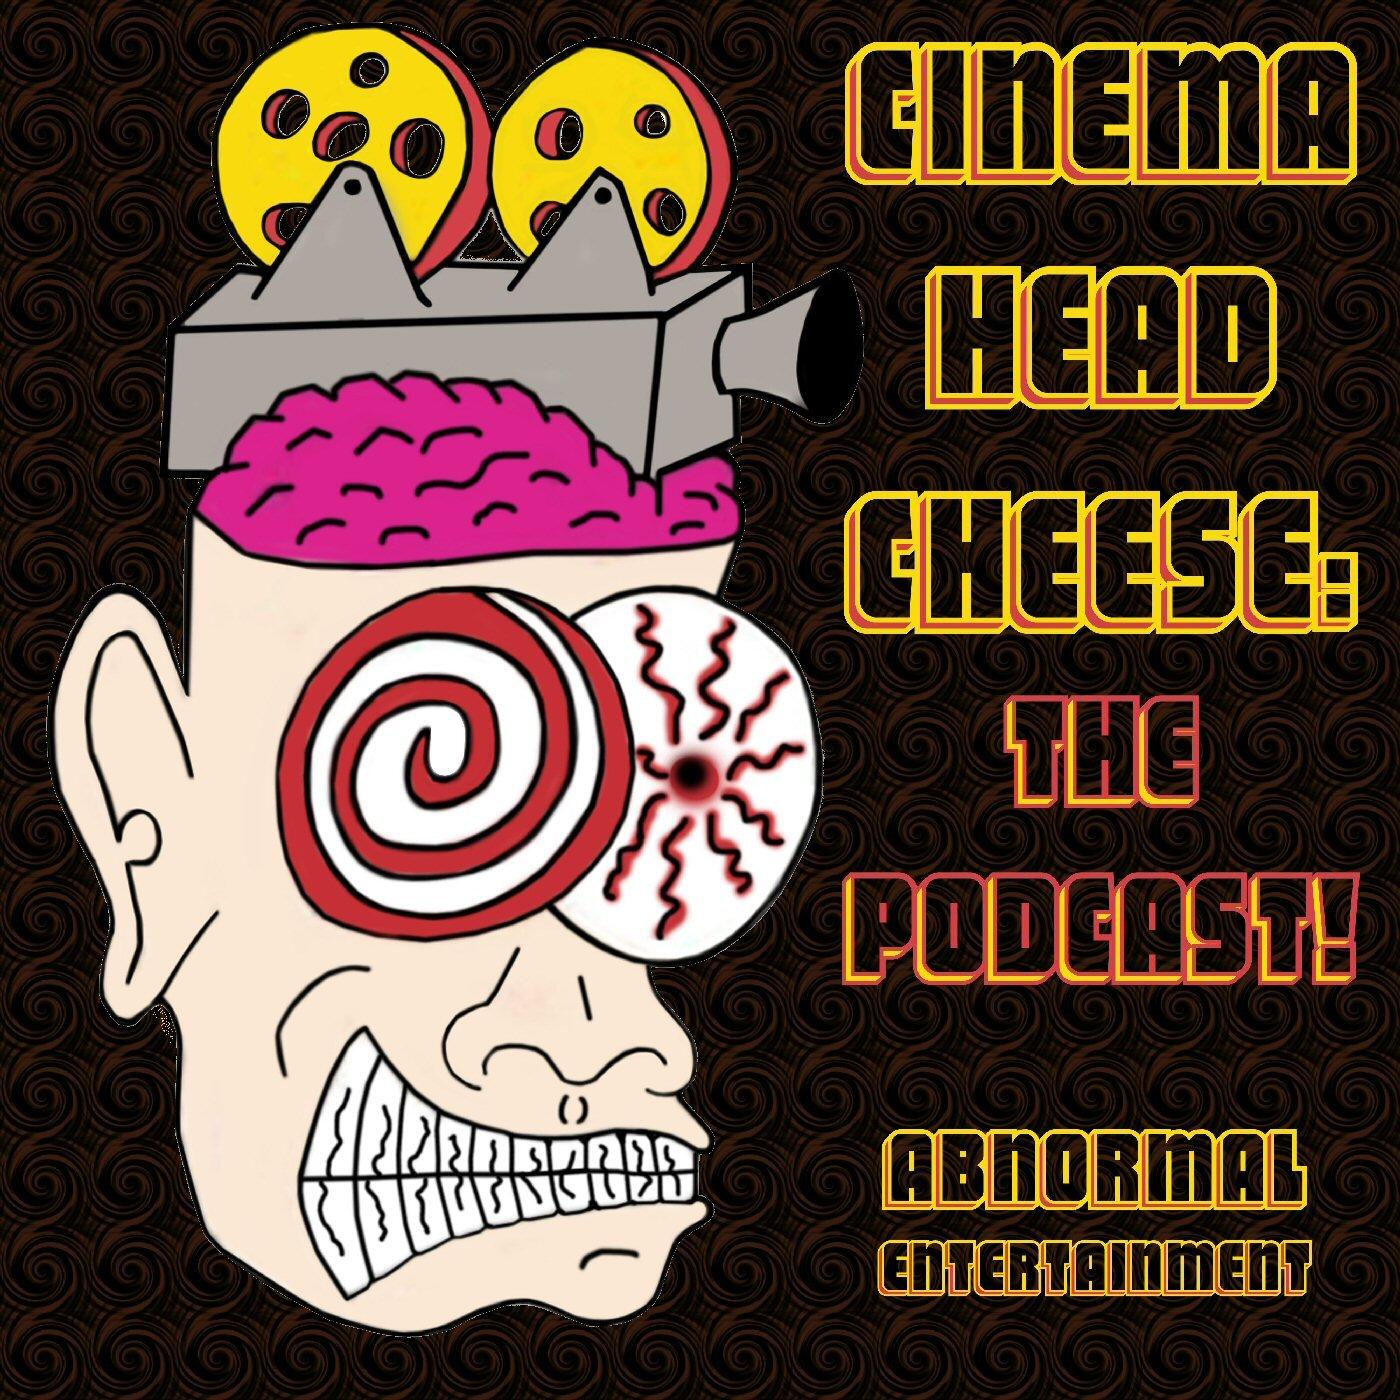 Cinema Head Cheese: The Podcast!